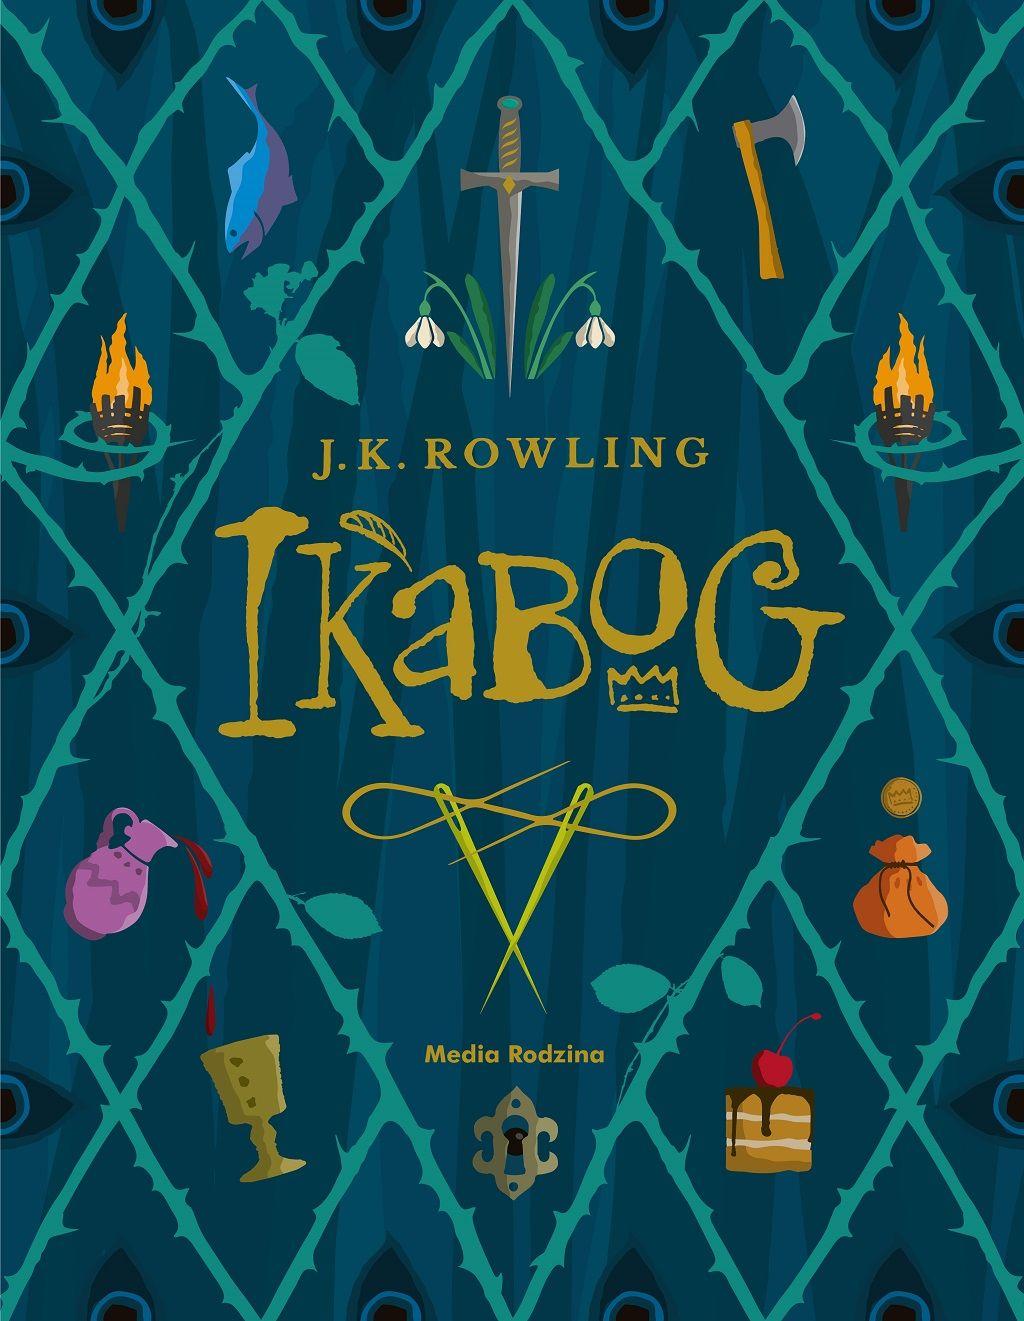 J.K. Rowling – Ikabog